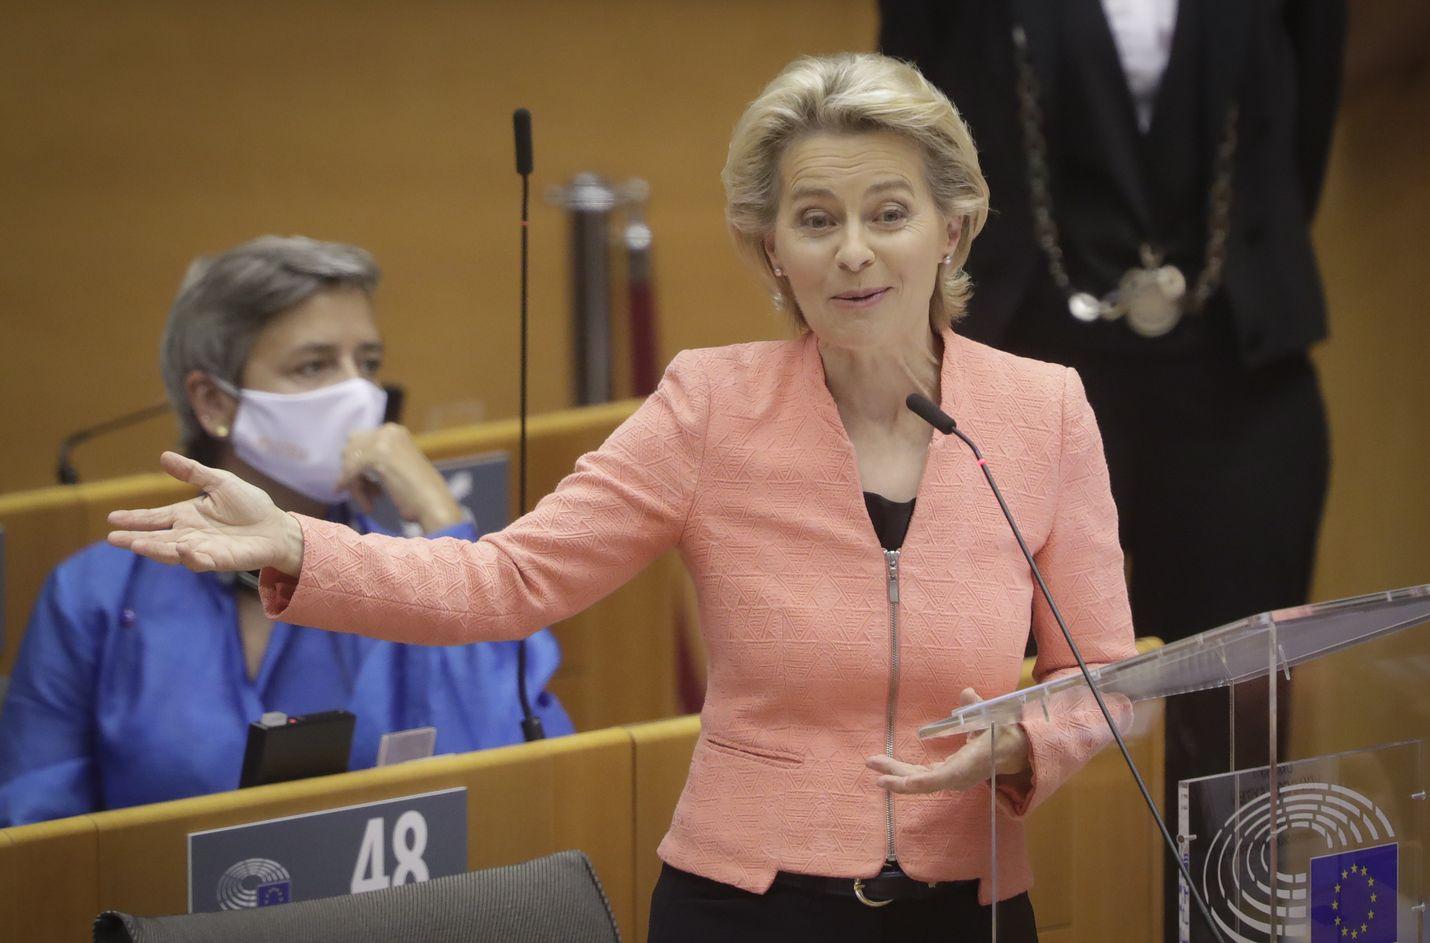 EU-komission puheenjohtaja Ursula von der Leyen puhui Euroopan parlamentissa keskiviikkona.